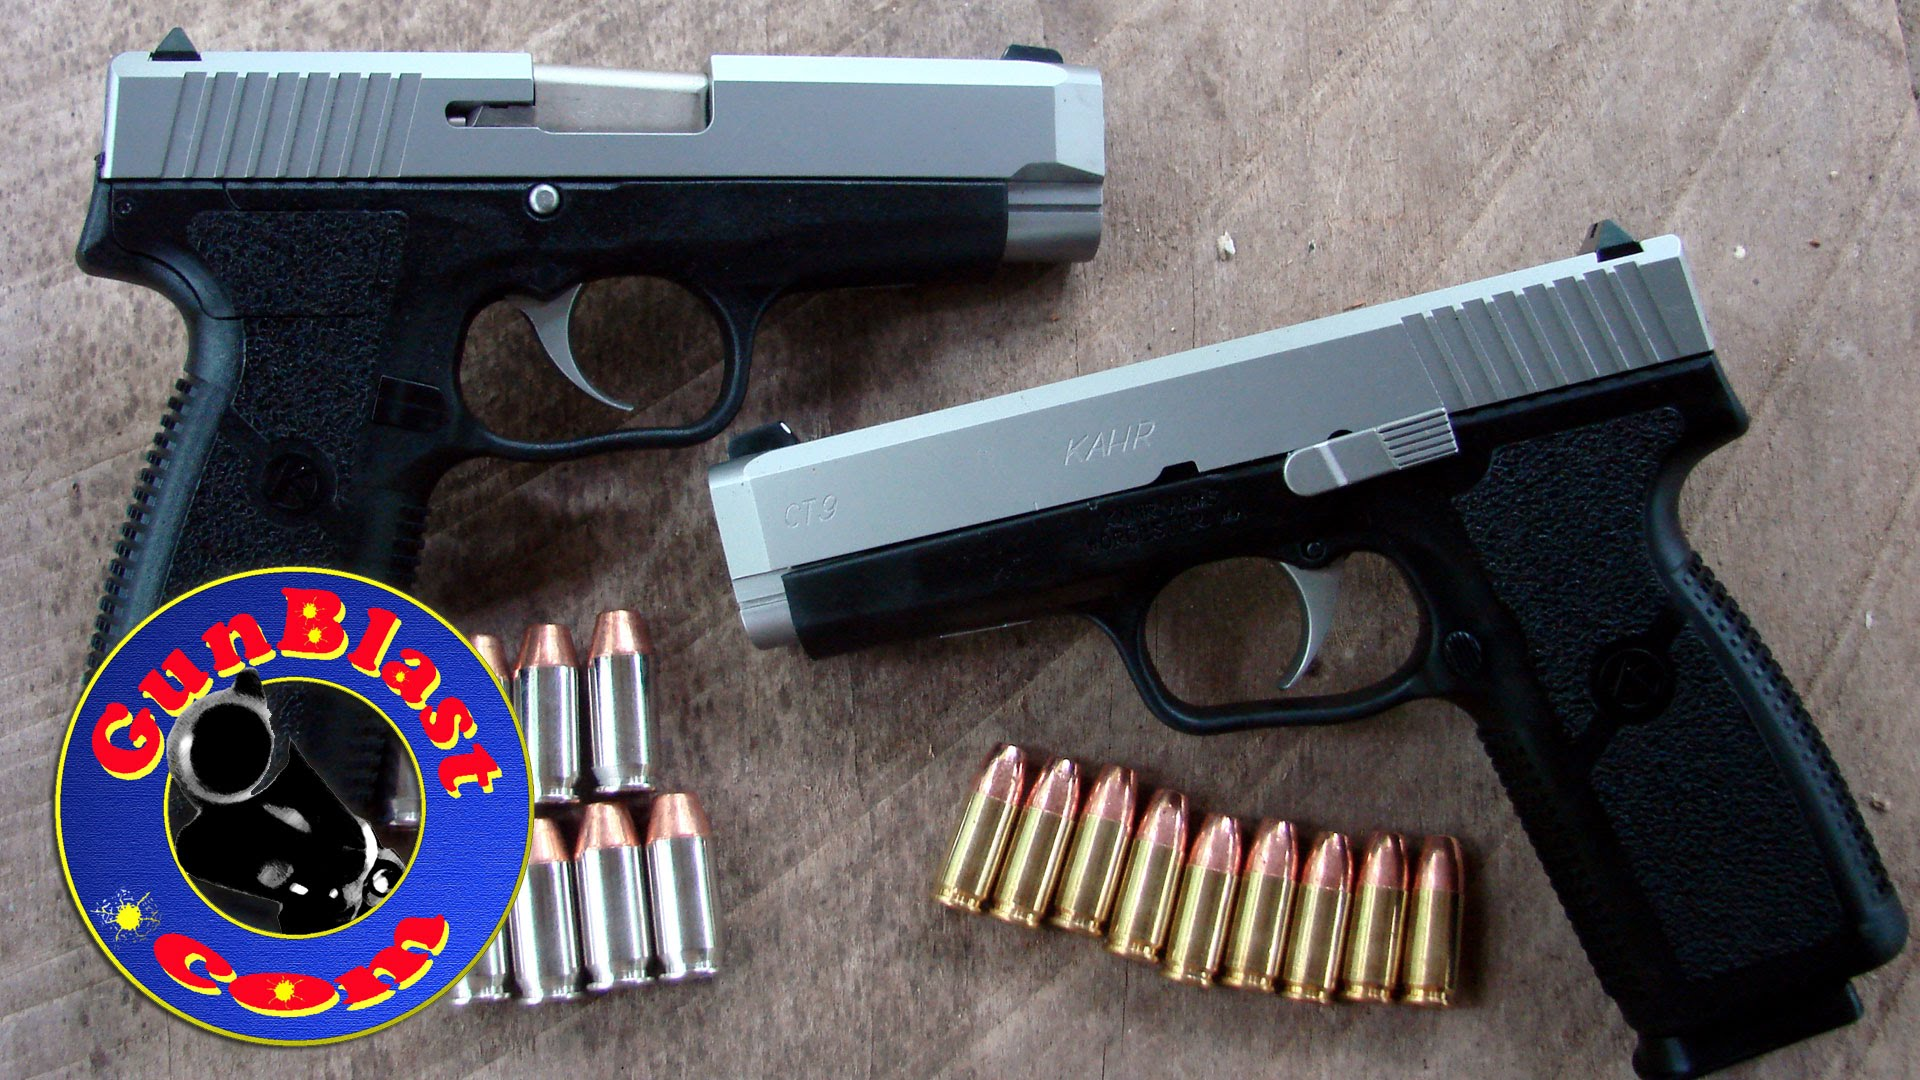 Kahr Pistols - CT9 & CT45